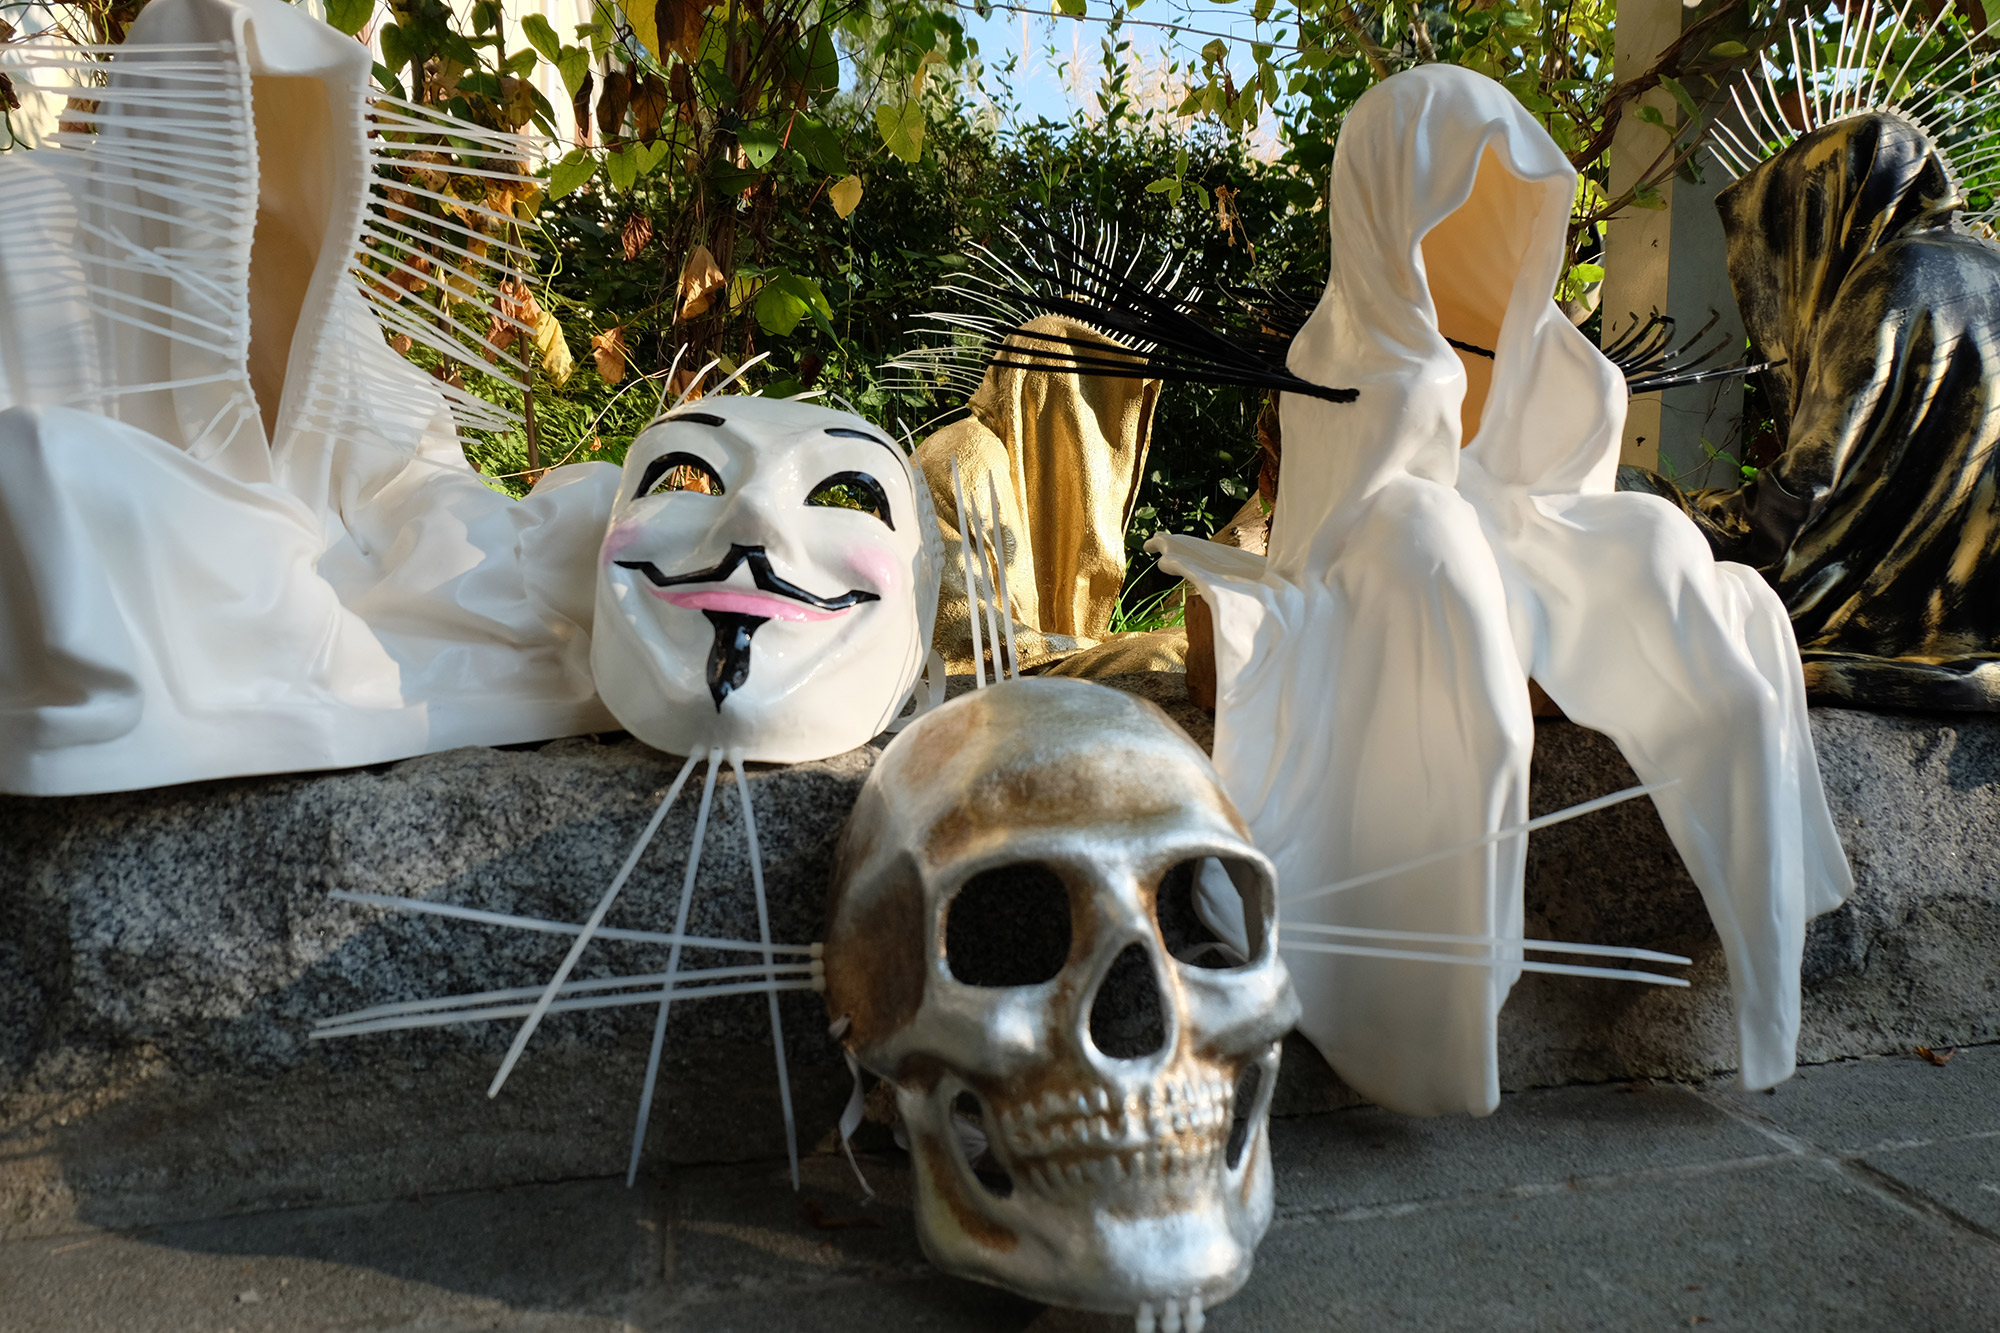 #faceless-#mask-#cableties-#ziptie-ty-#guardiansoftime-#manfredkielnhofer-#contemporaryart-#arts-#design-#sculpture-#statue-#museum-#gallery-#fineart-#lightart-#ghost-#anonymous-8122